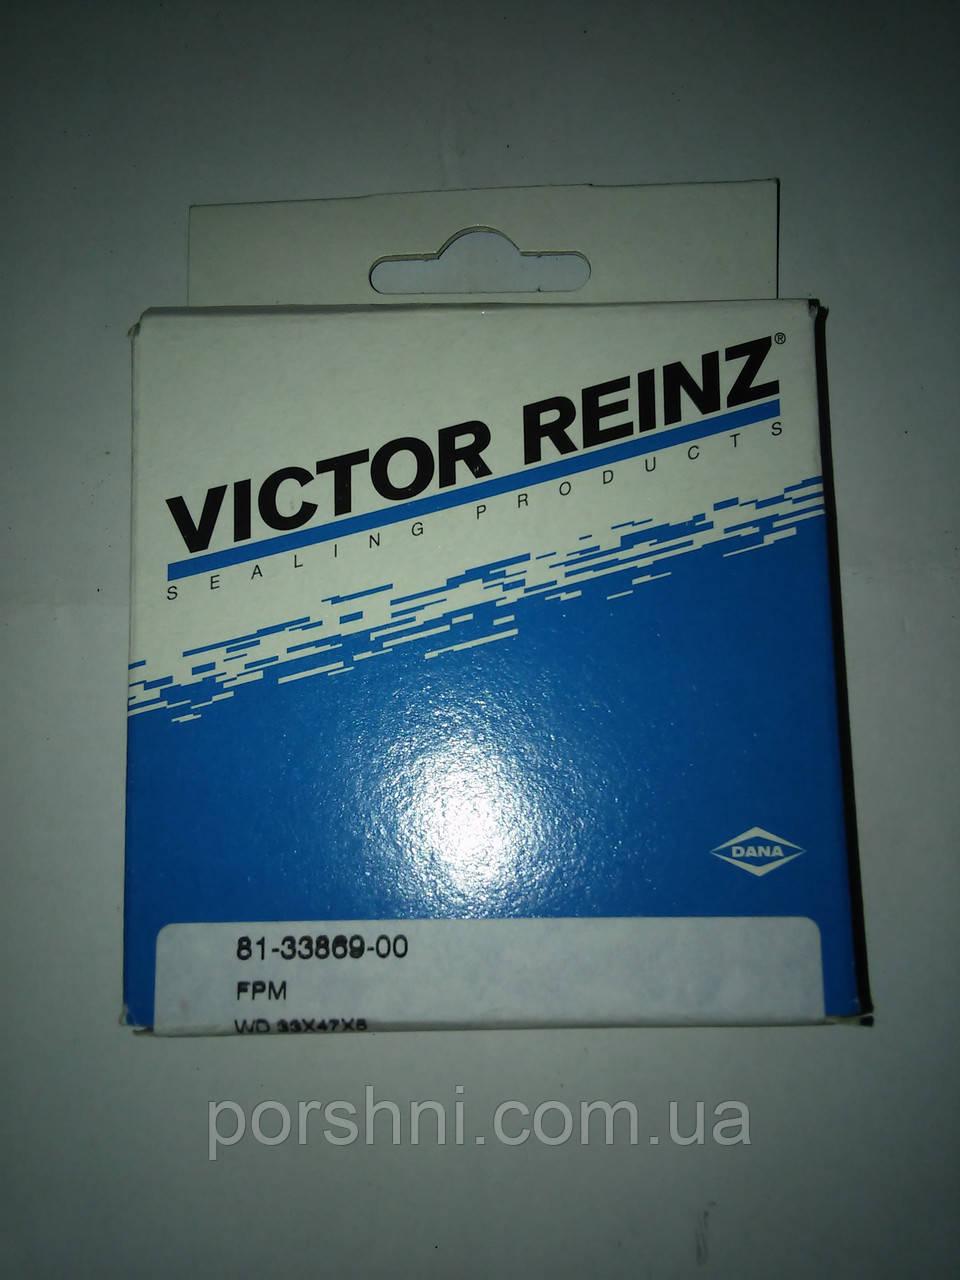 Сальники   33 х 47 х 5  коленвала Ford  Fiesta Focus  1.25 - 1.6   V/R  81-33869-00